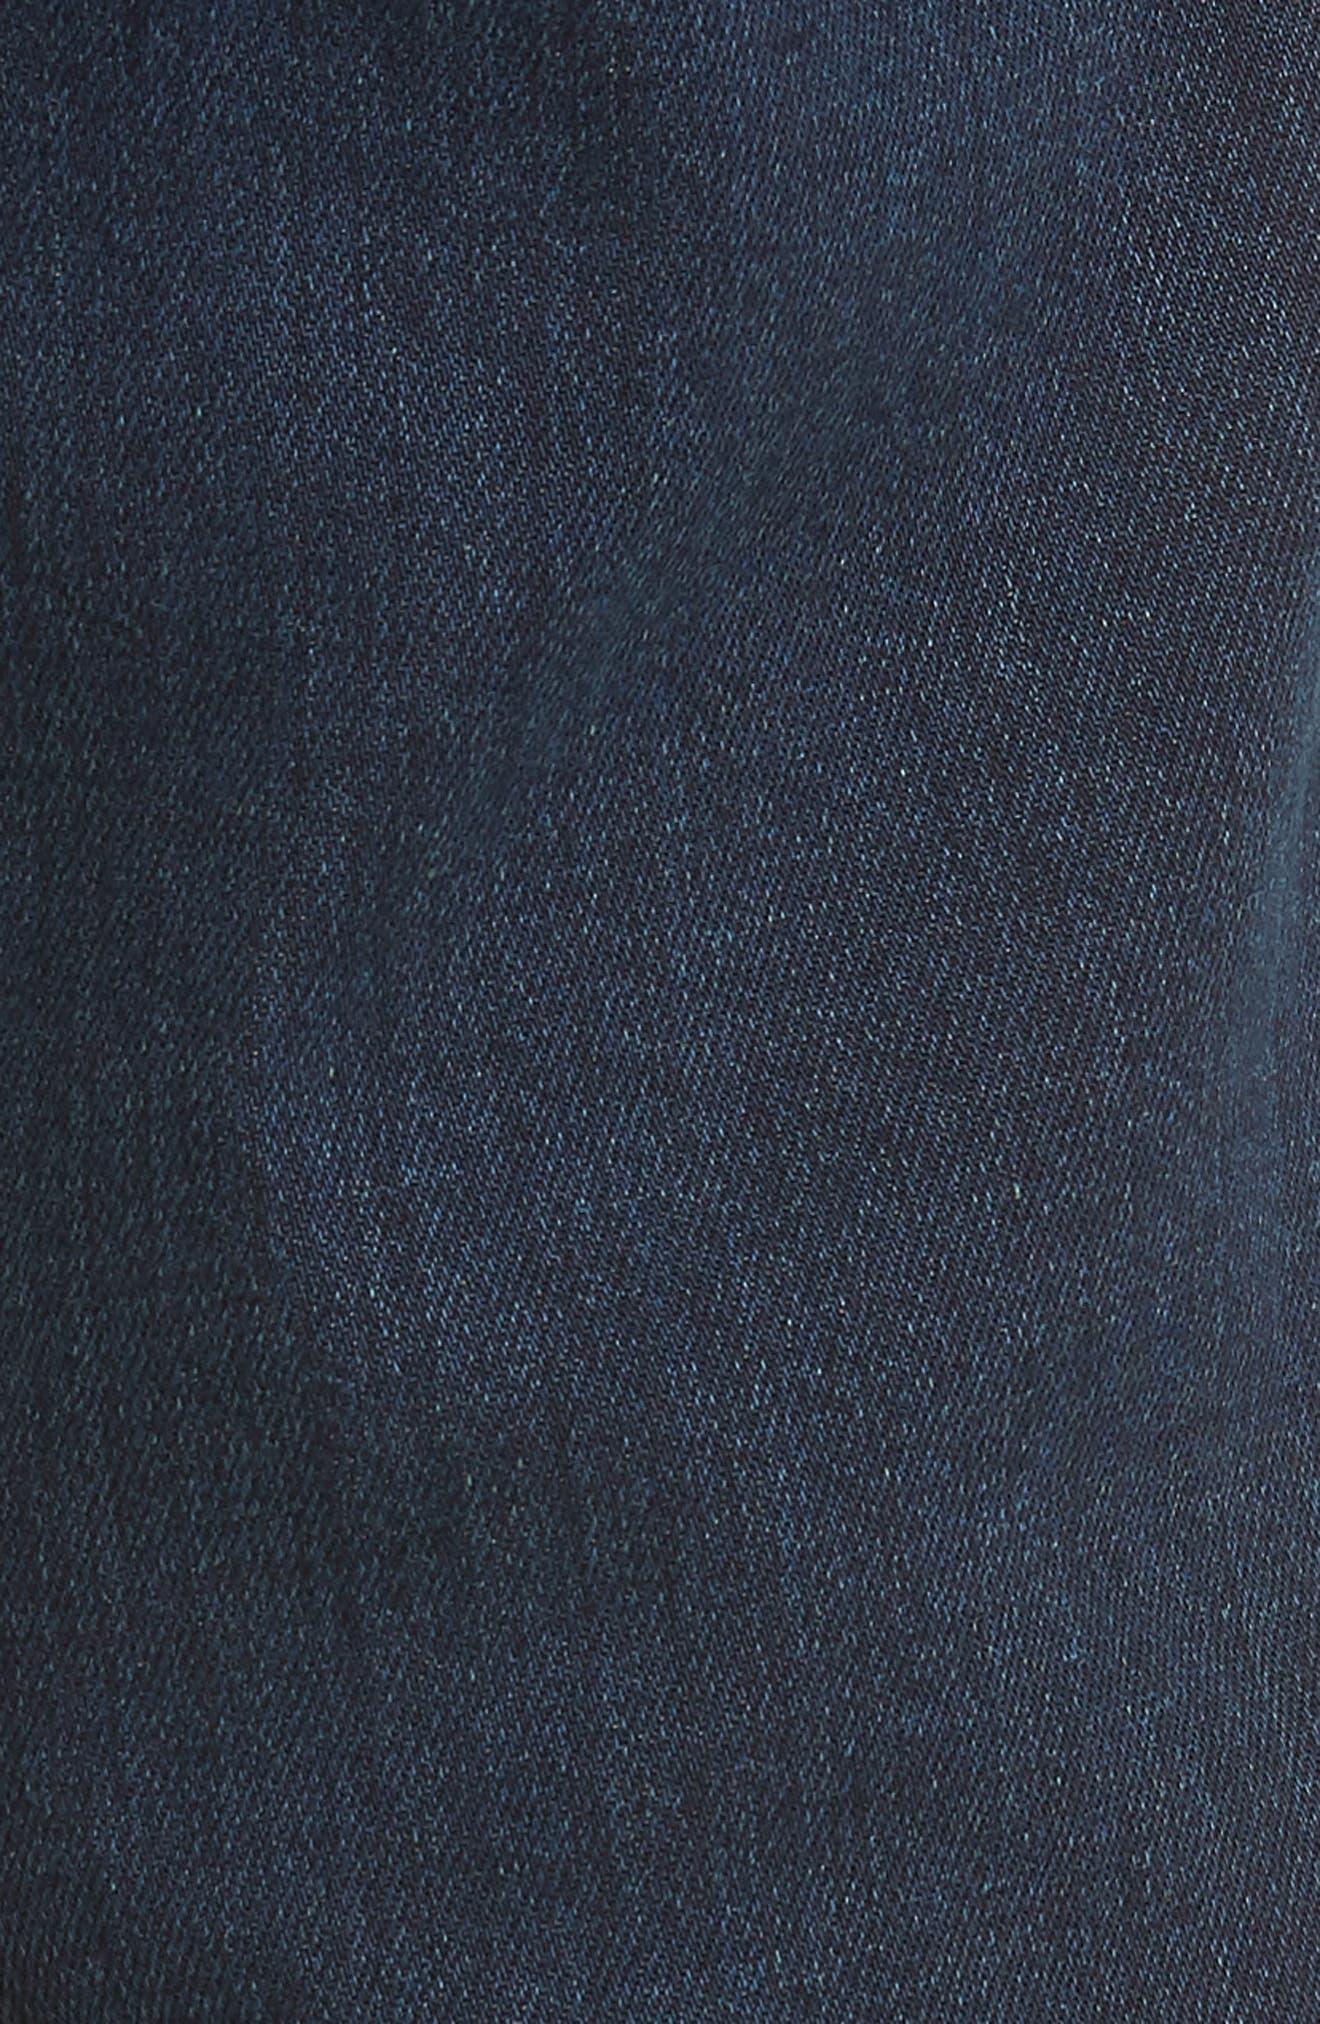 Thommer Skinny Fit Jeans,                             Alternate thumbnail 5, color,                             Blue